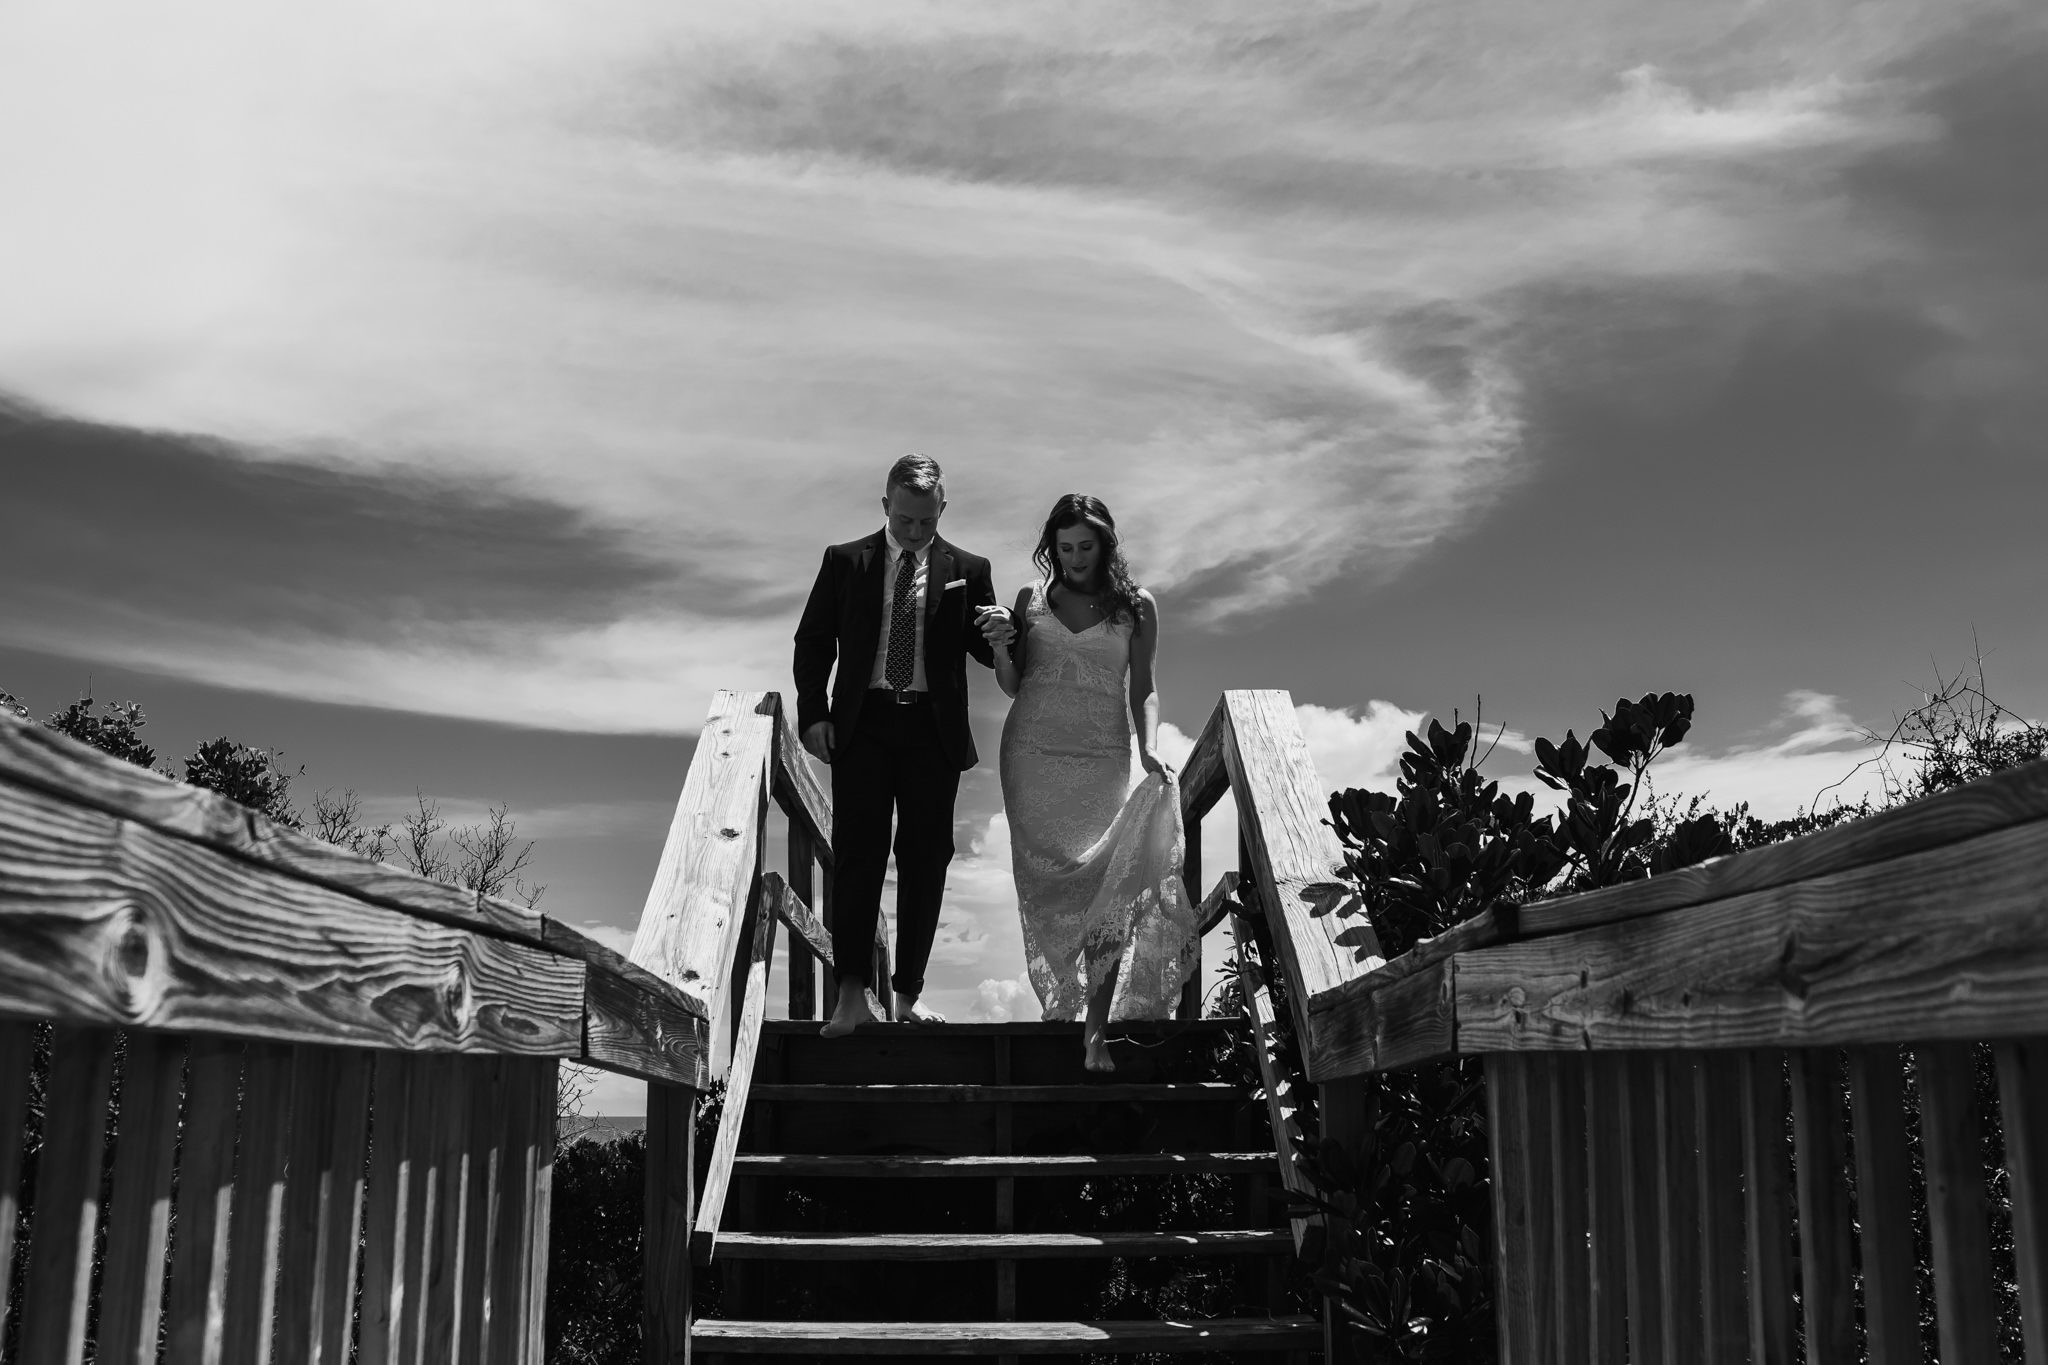 cassie-cook-photography-santa-rosa-beach-wedding-farrar-wedding-26.jpg